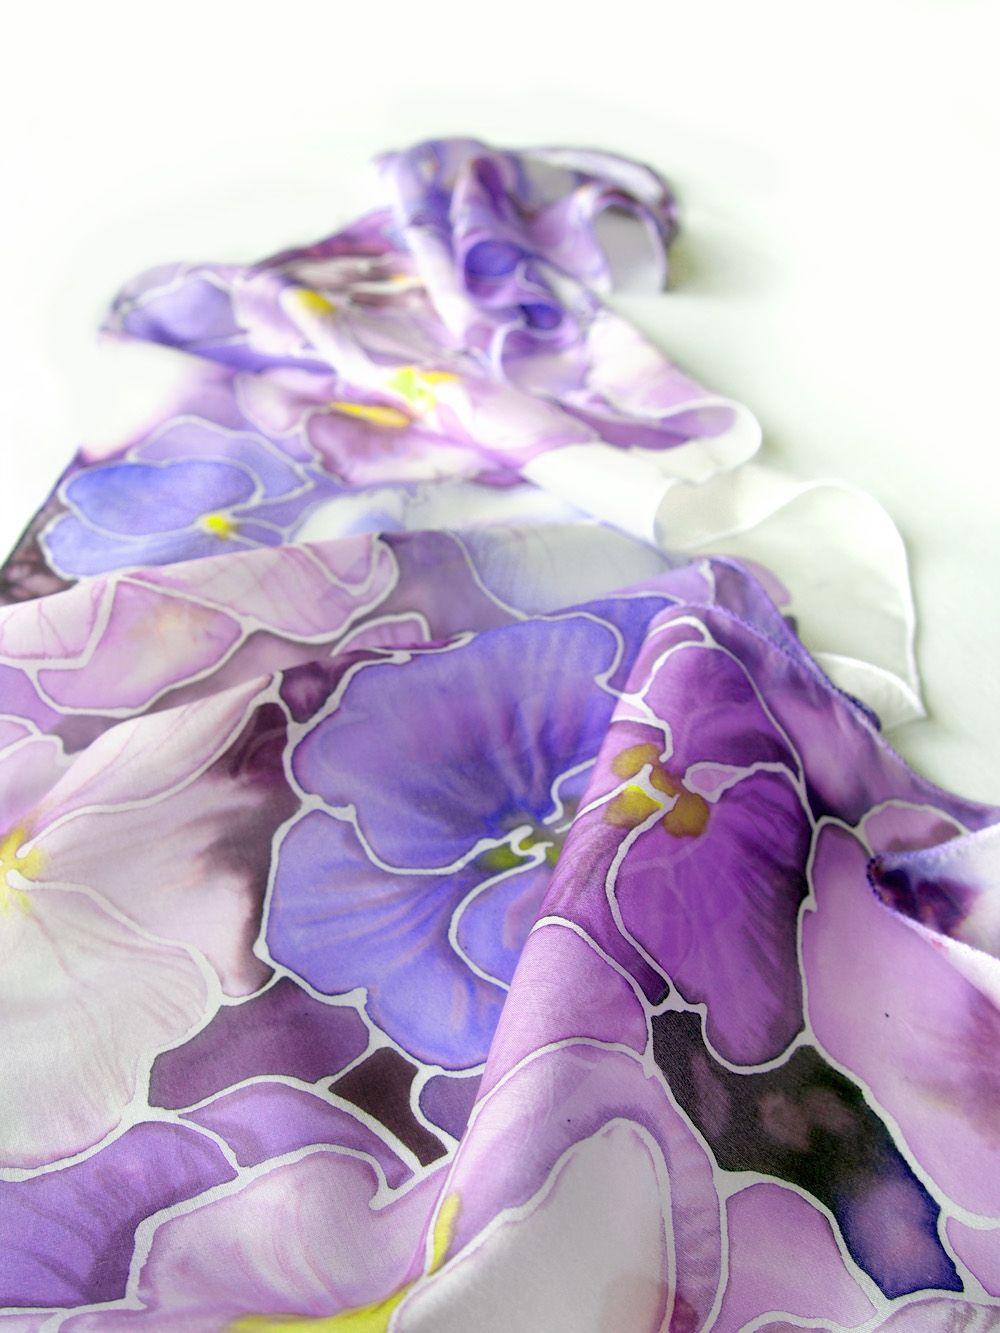 Purple Flower Bird Scarf Mauve Lilac Birds Scarves Wrap Shawl Floral Blossom New